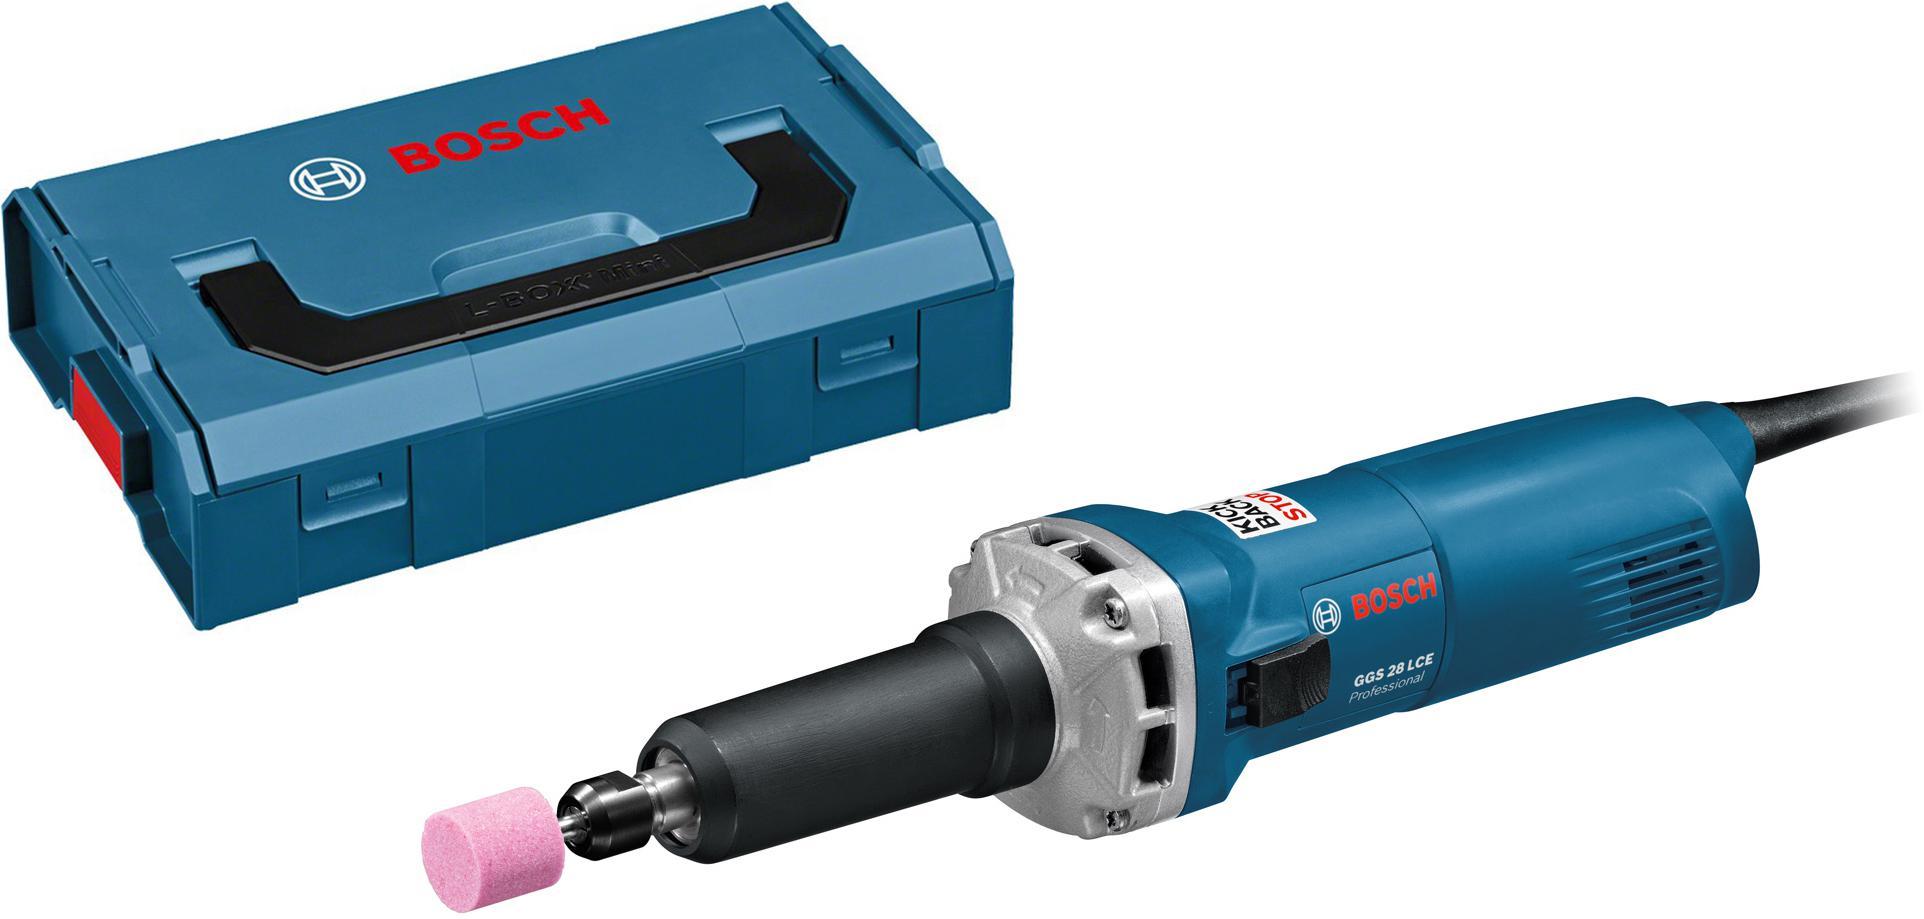 Набор Bosch Машинка шлифовальная прямая ggs 28 lce (0.601.221.100) +Ящик l-boxx mini (1.600.a00.7sf) гравер bosch ggs 28 lce professional